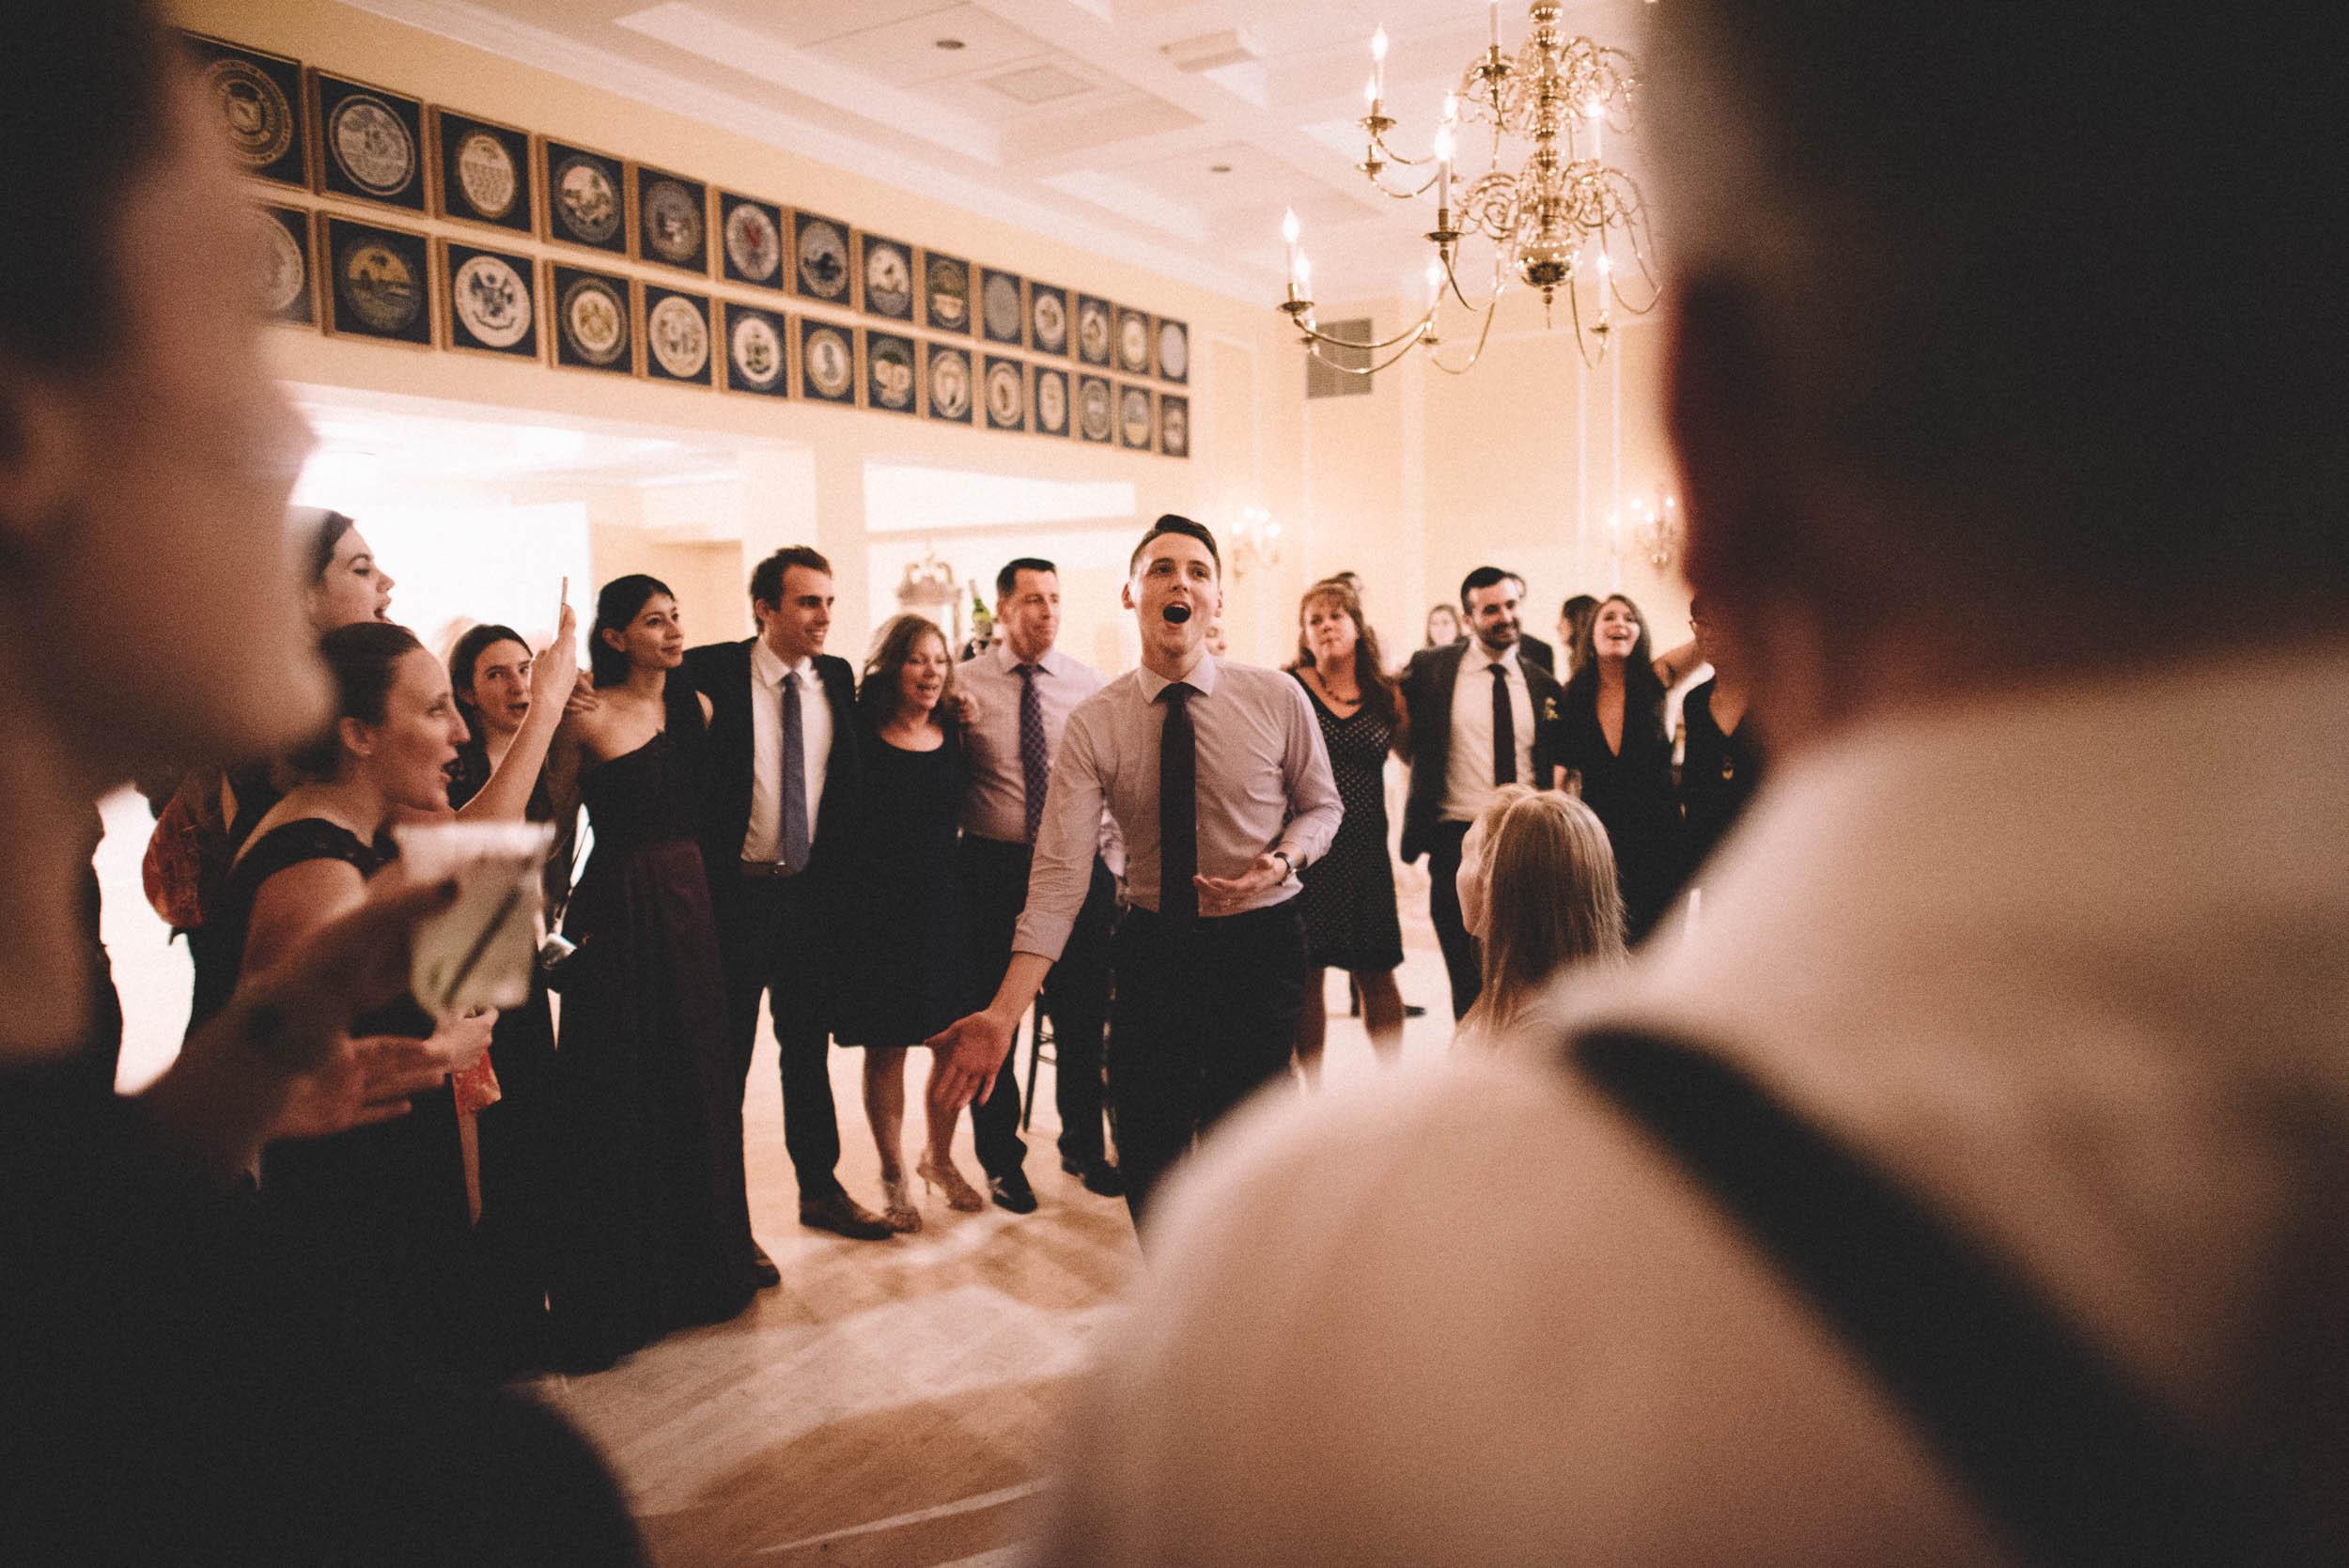 Dumbarton-House-wedding-95.jpg